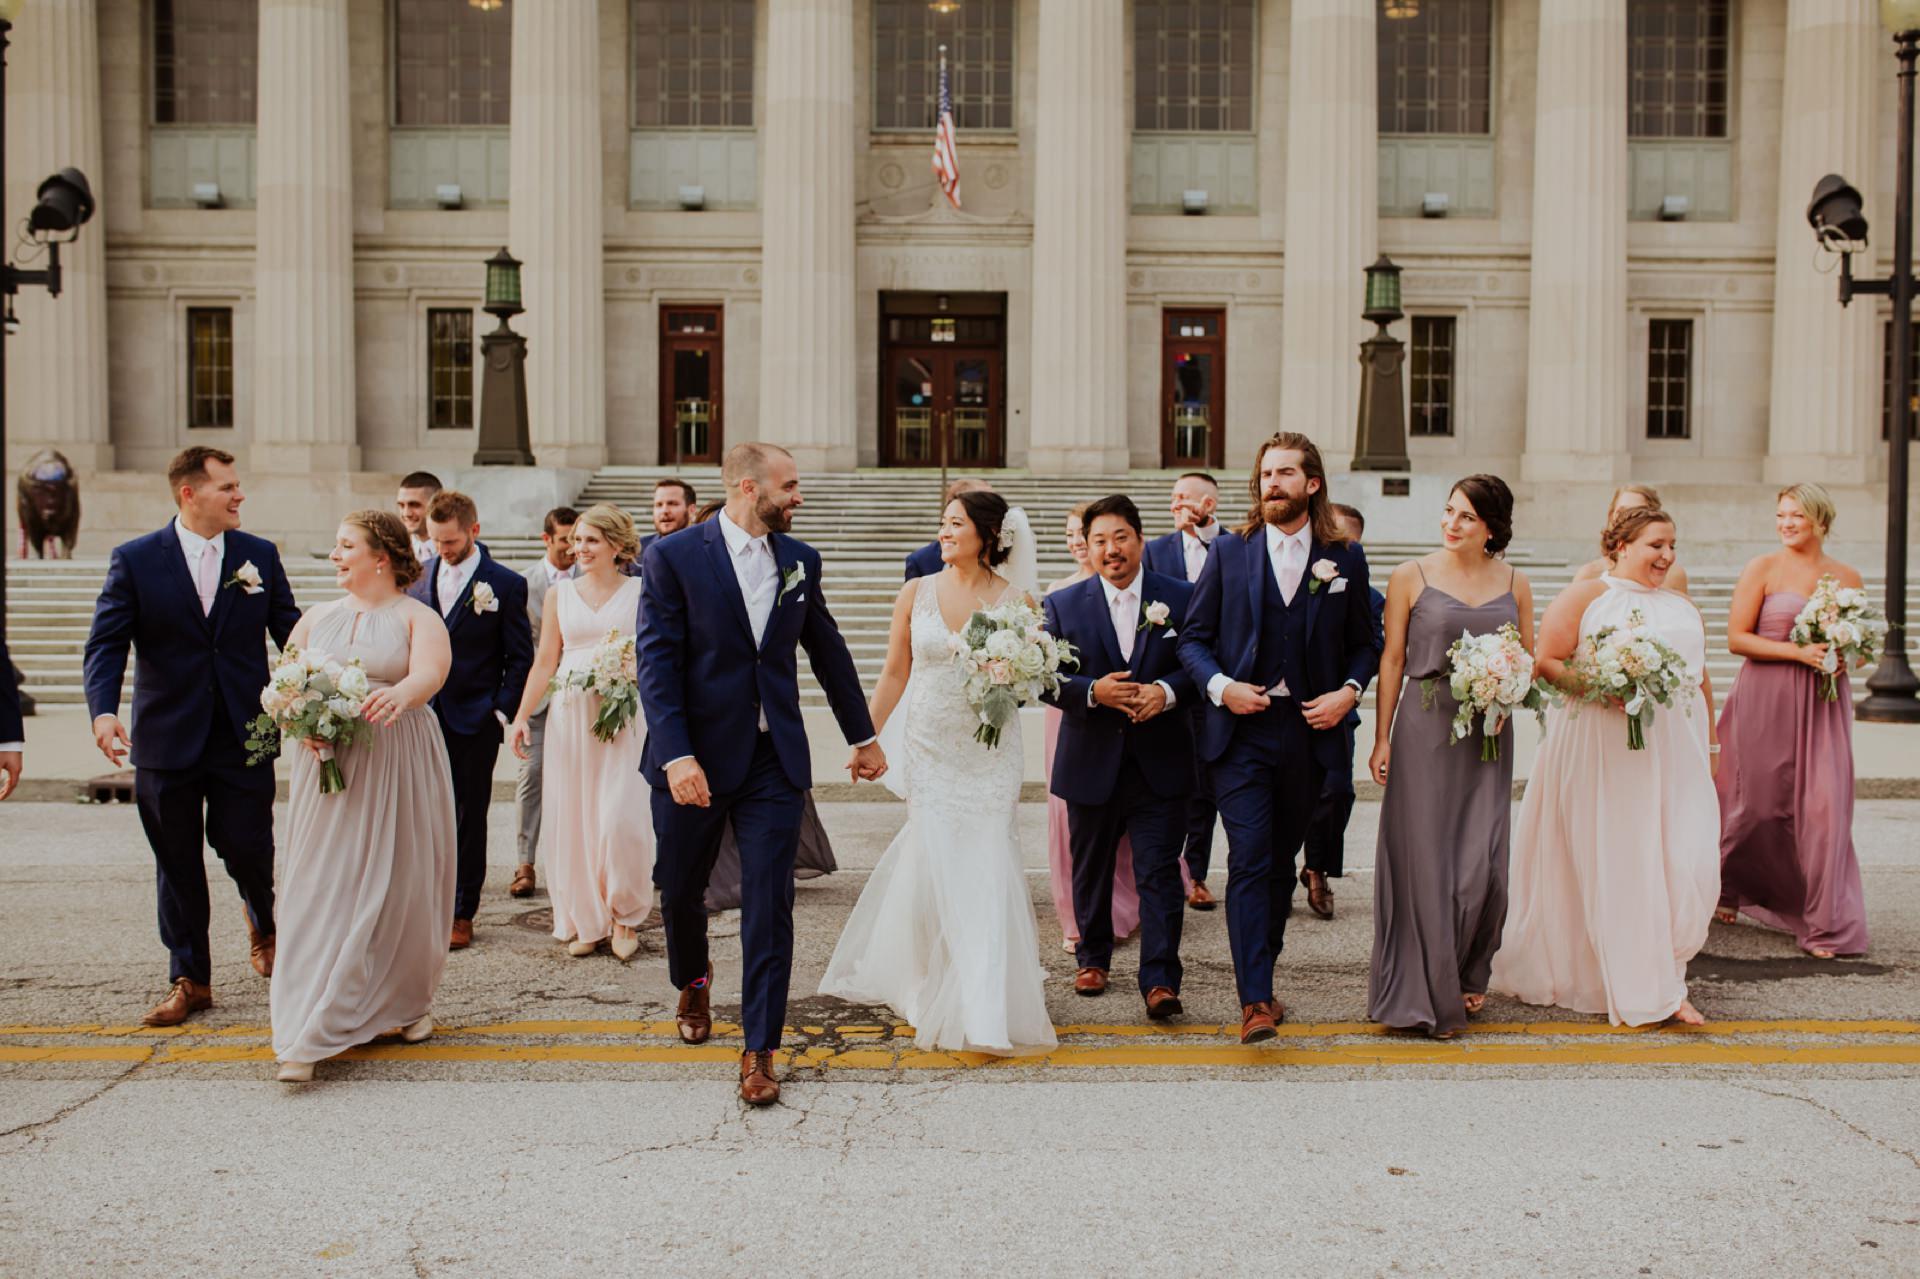 Indianapolis-Public-Library-Wedding_055.jpg